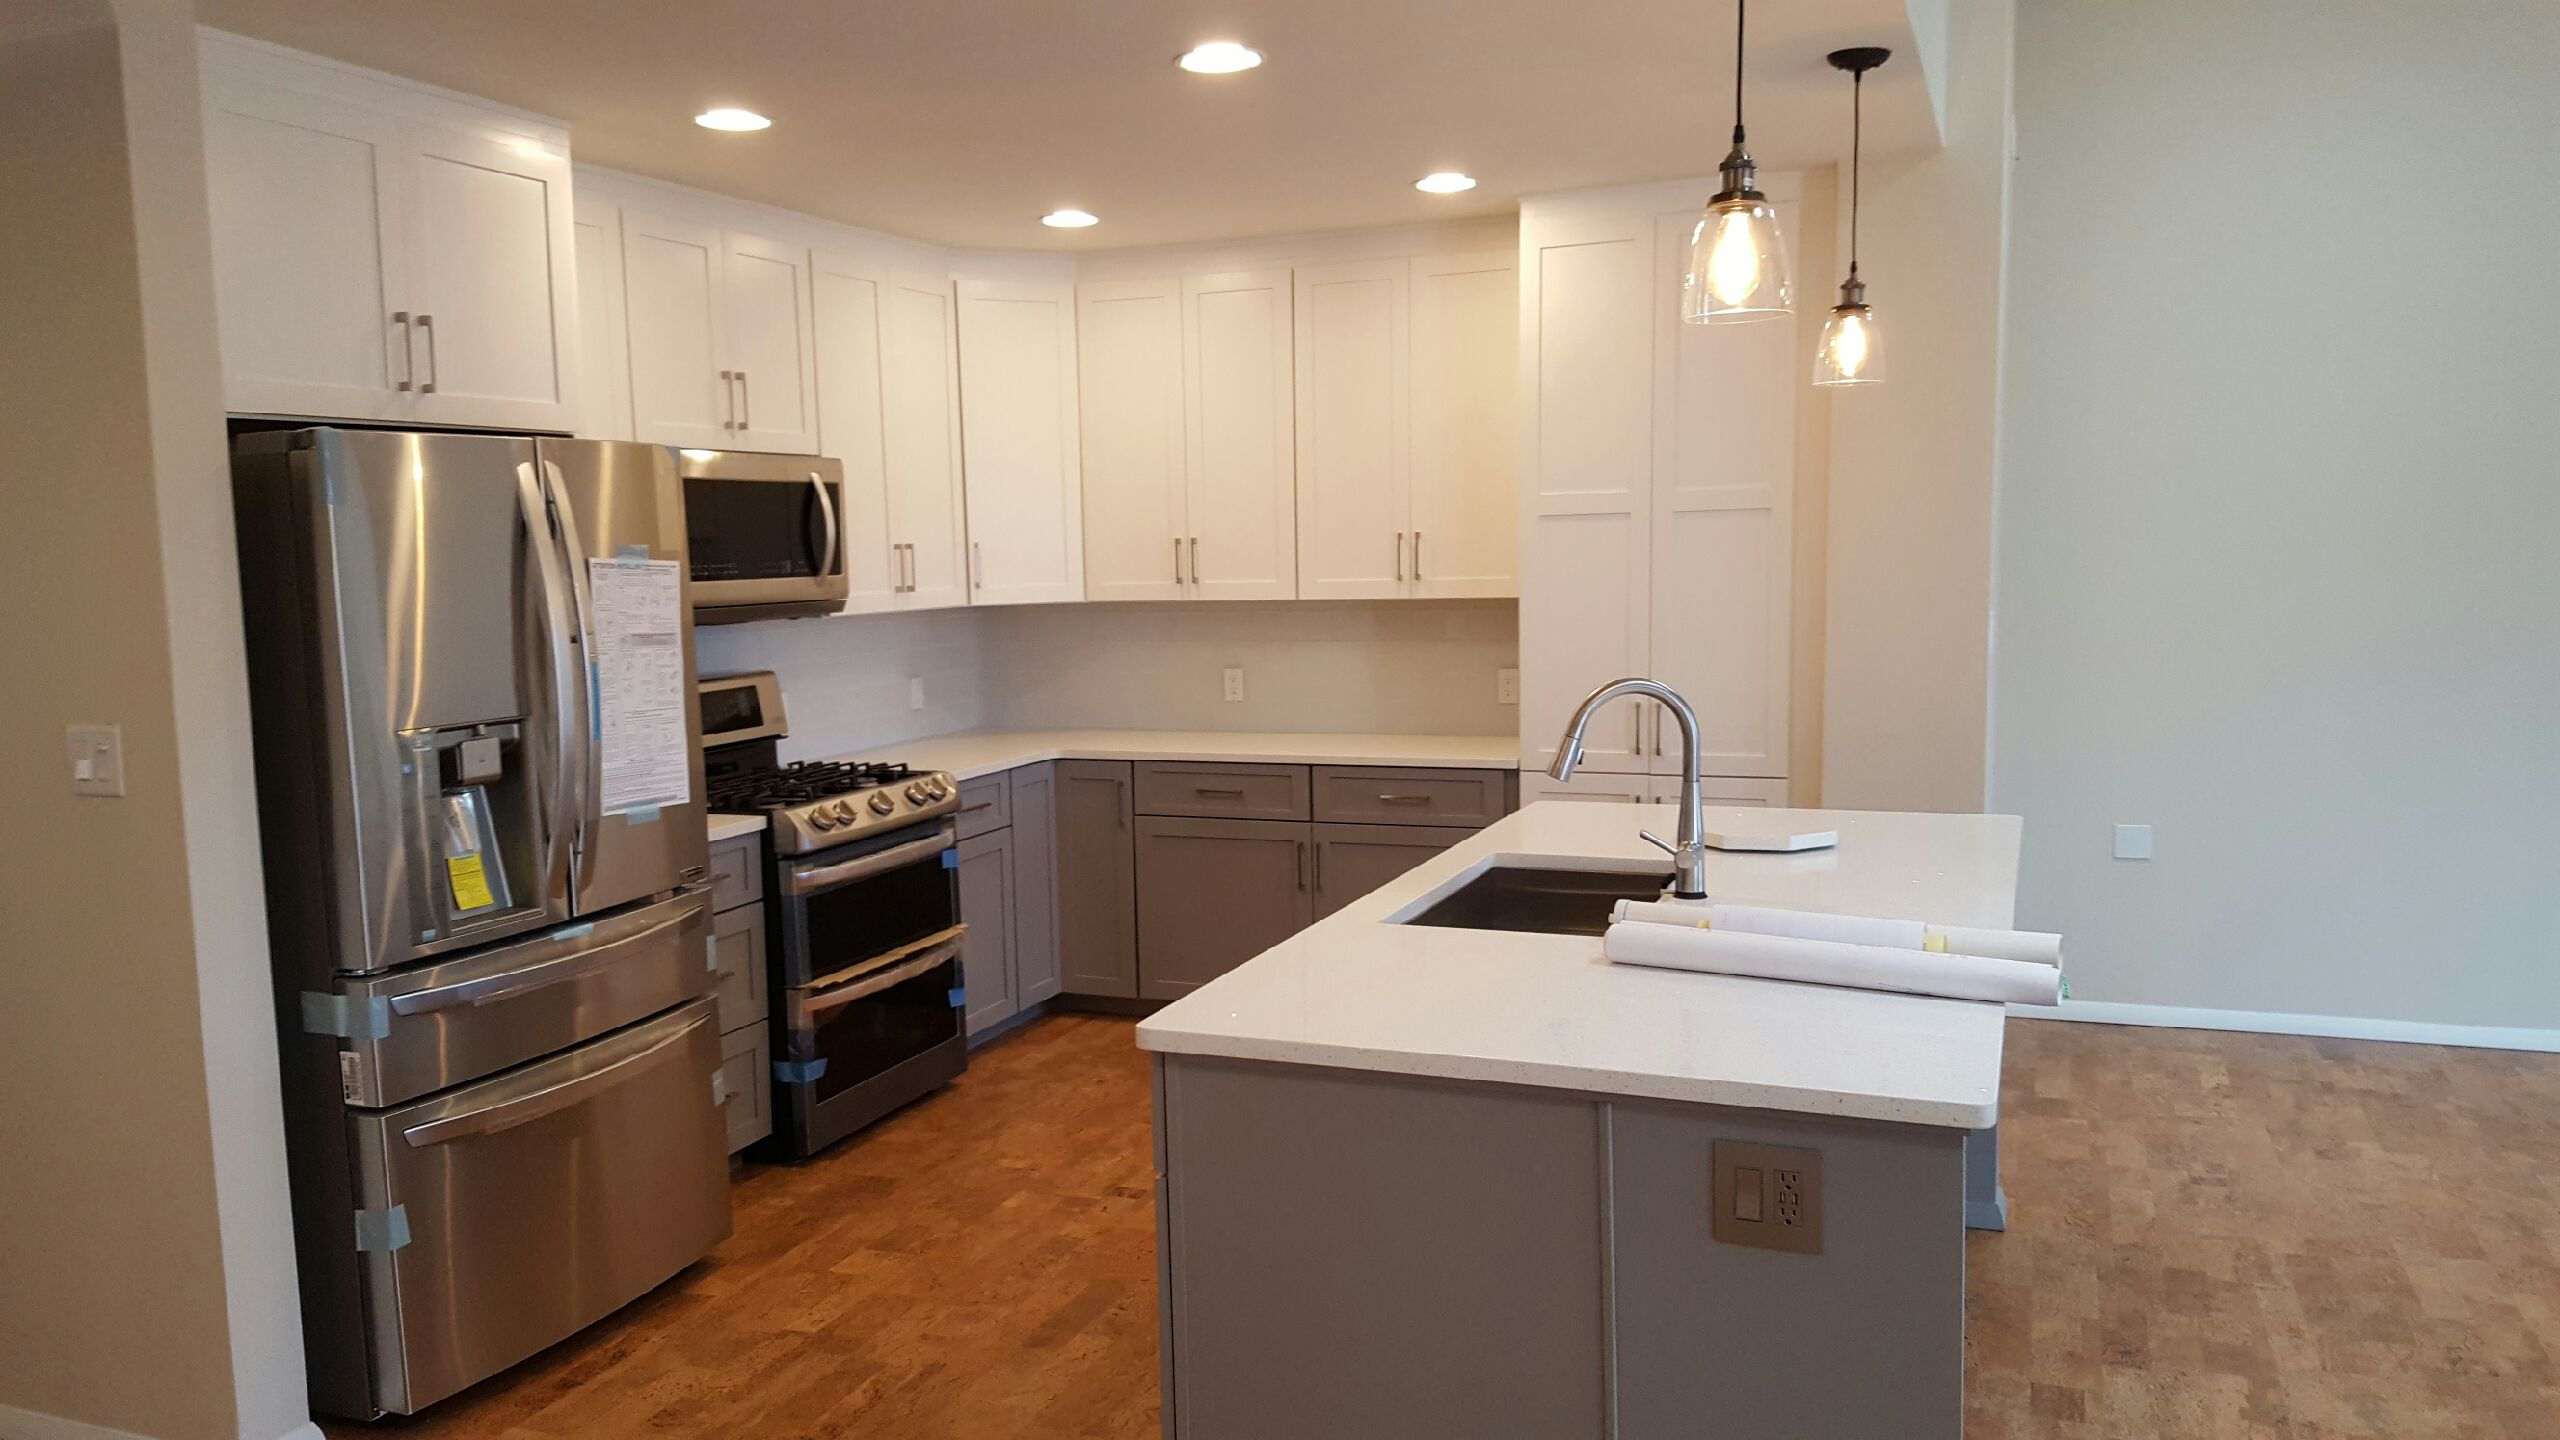 Acbrokers albuquerque cabinet brokers for Albuquerque kitchen cabinets